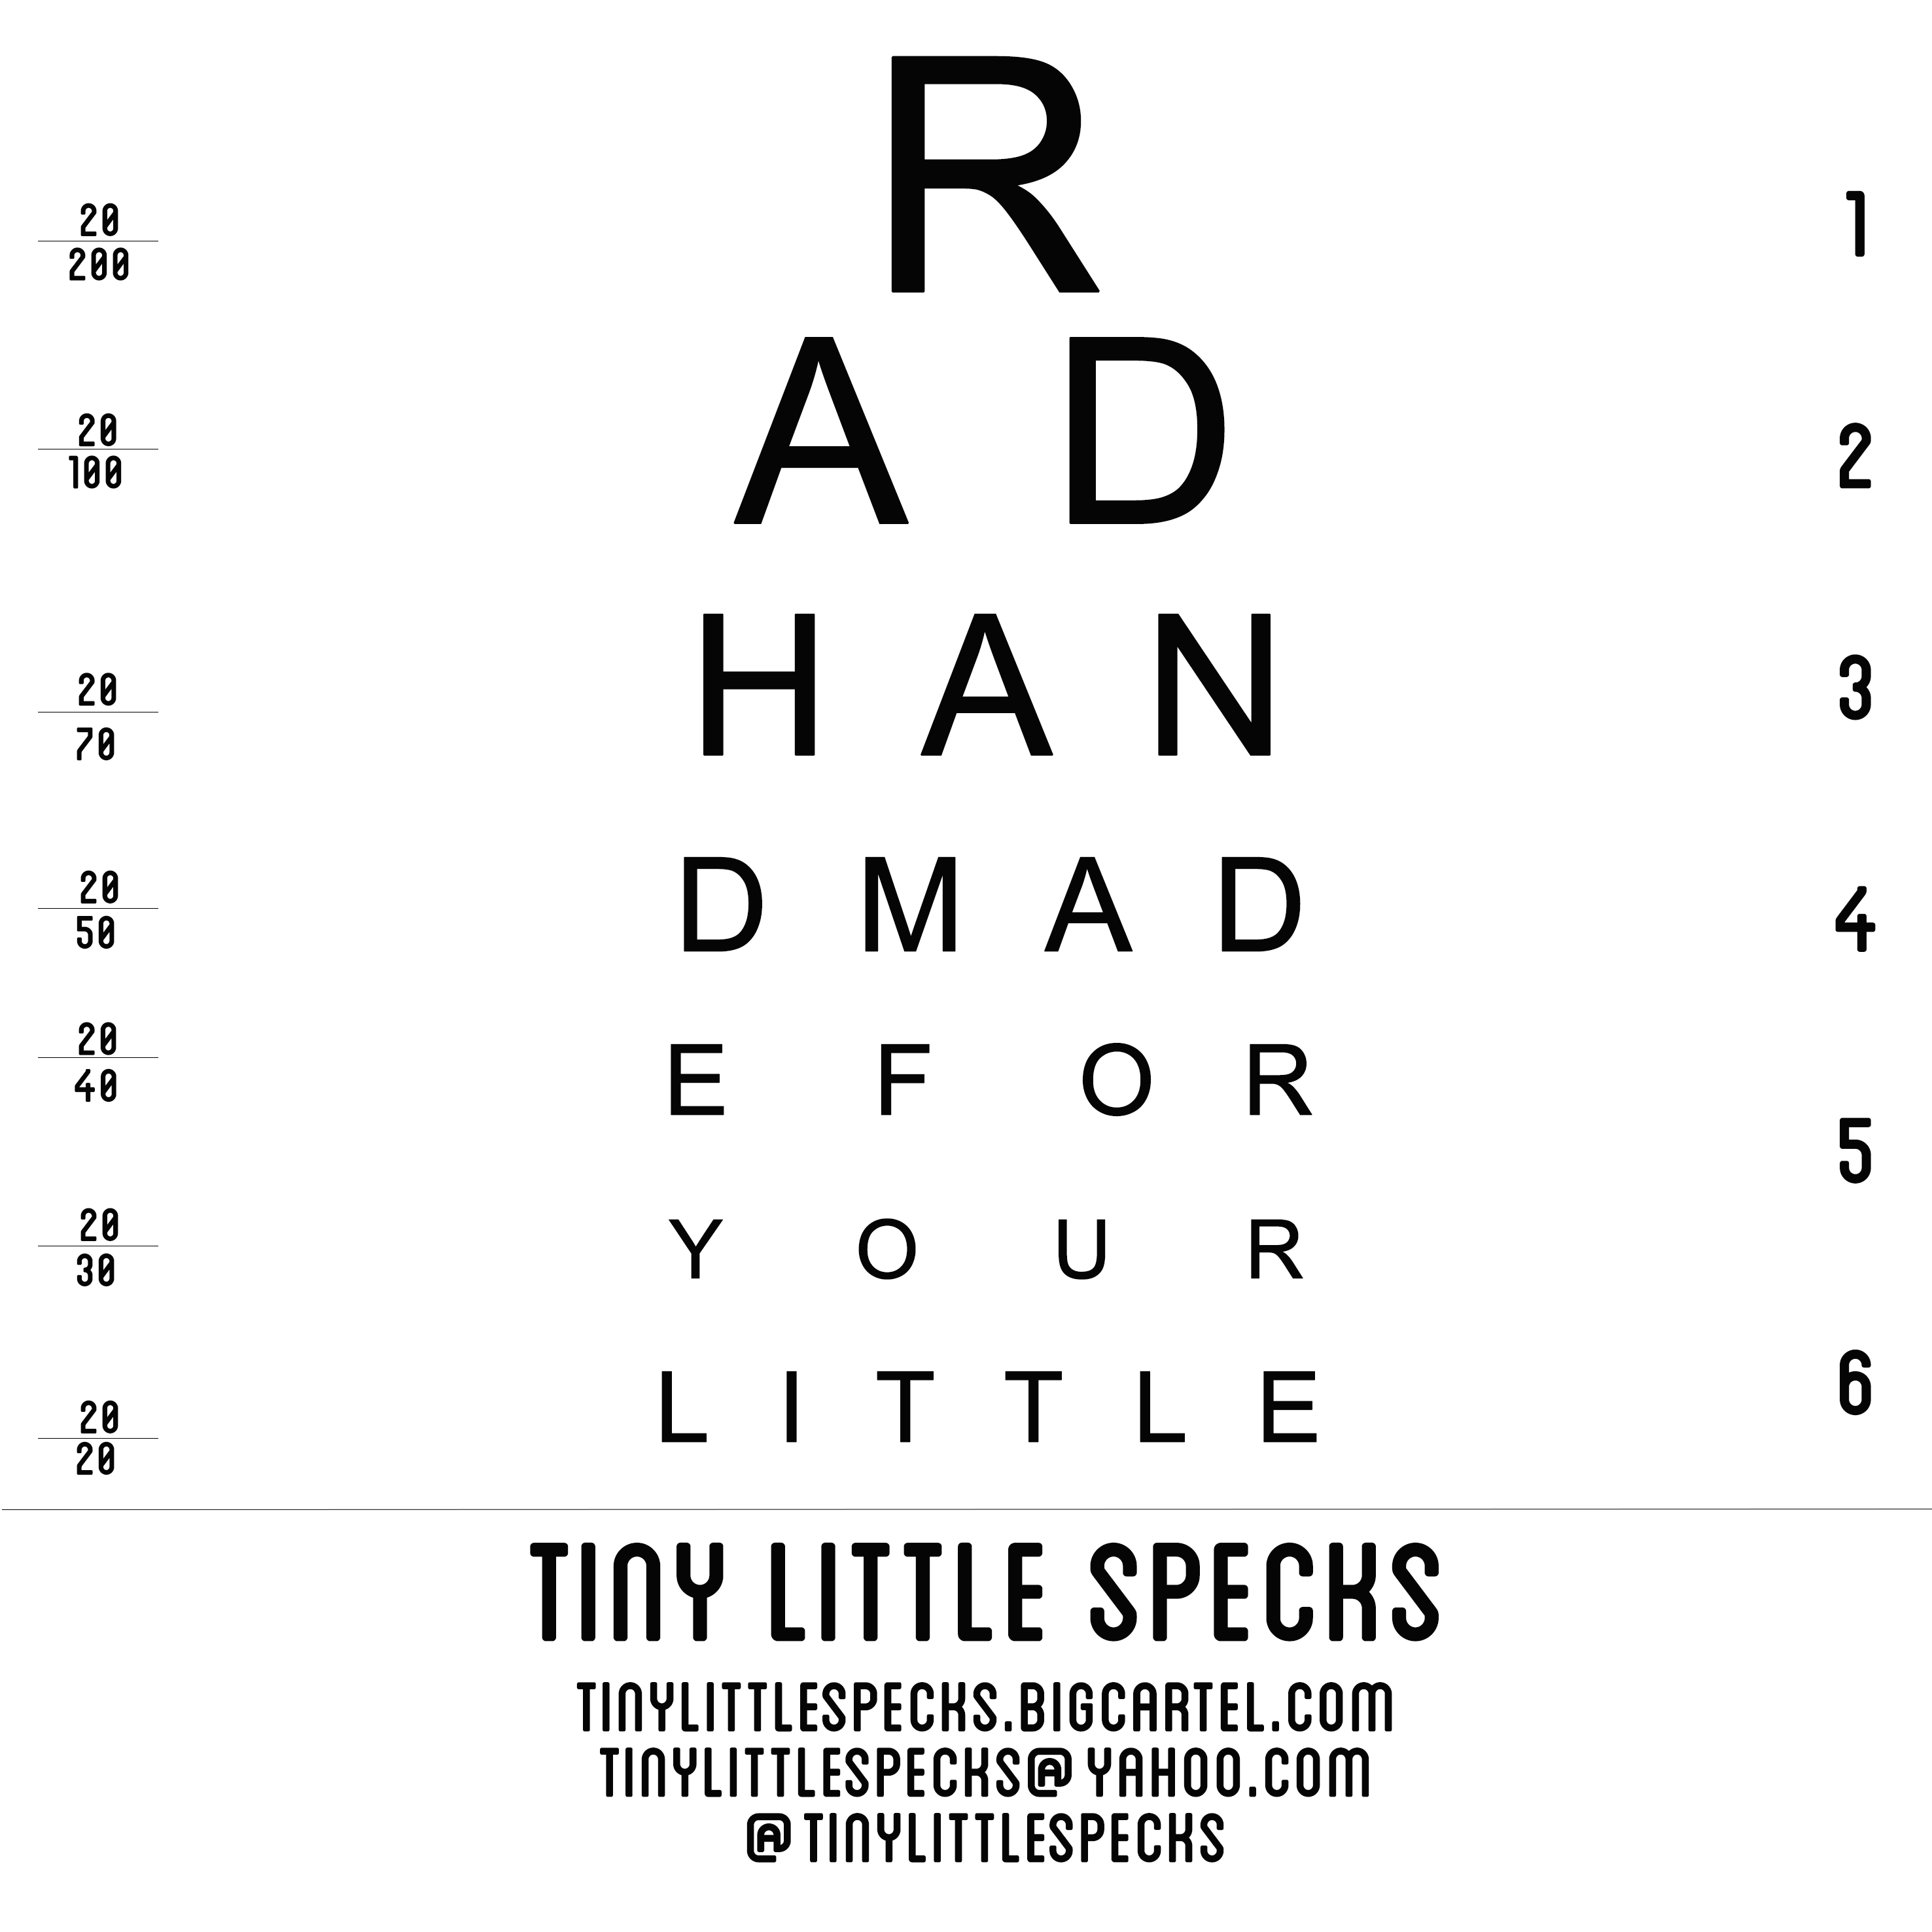 Tiny Little Specks